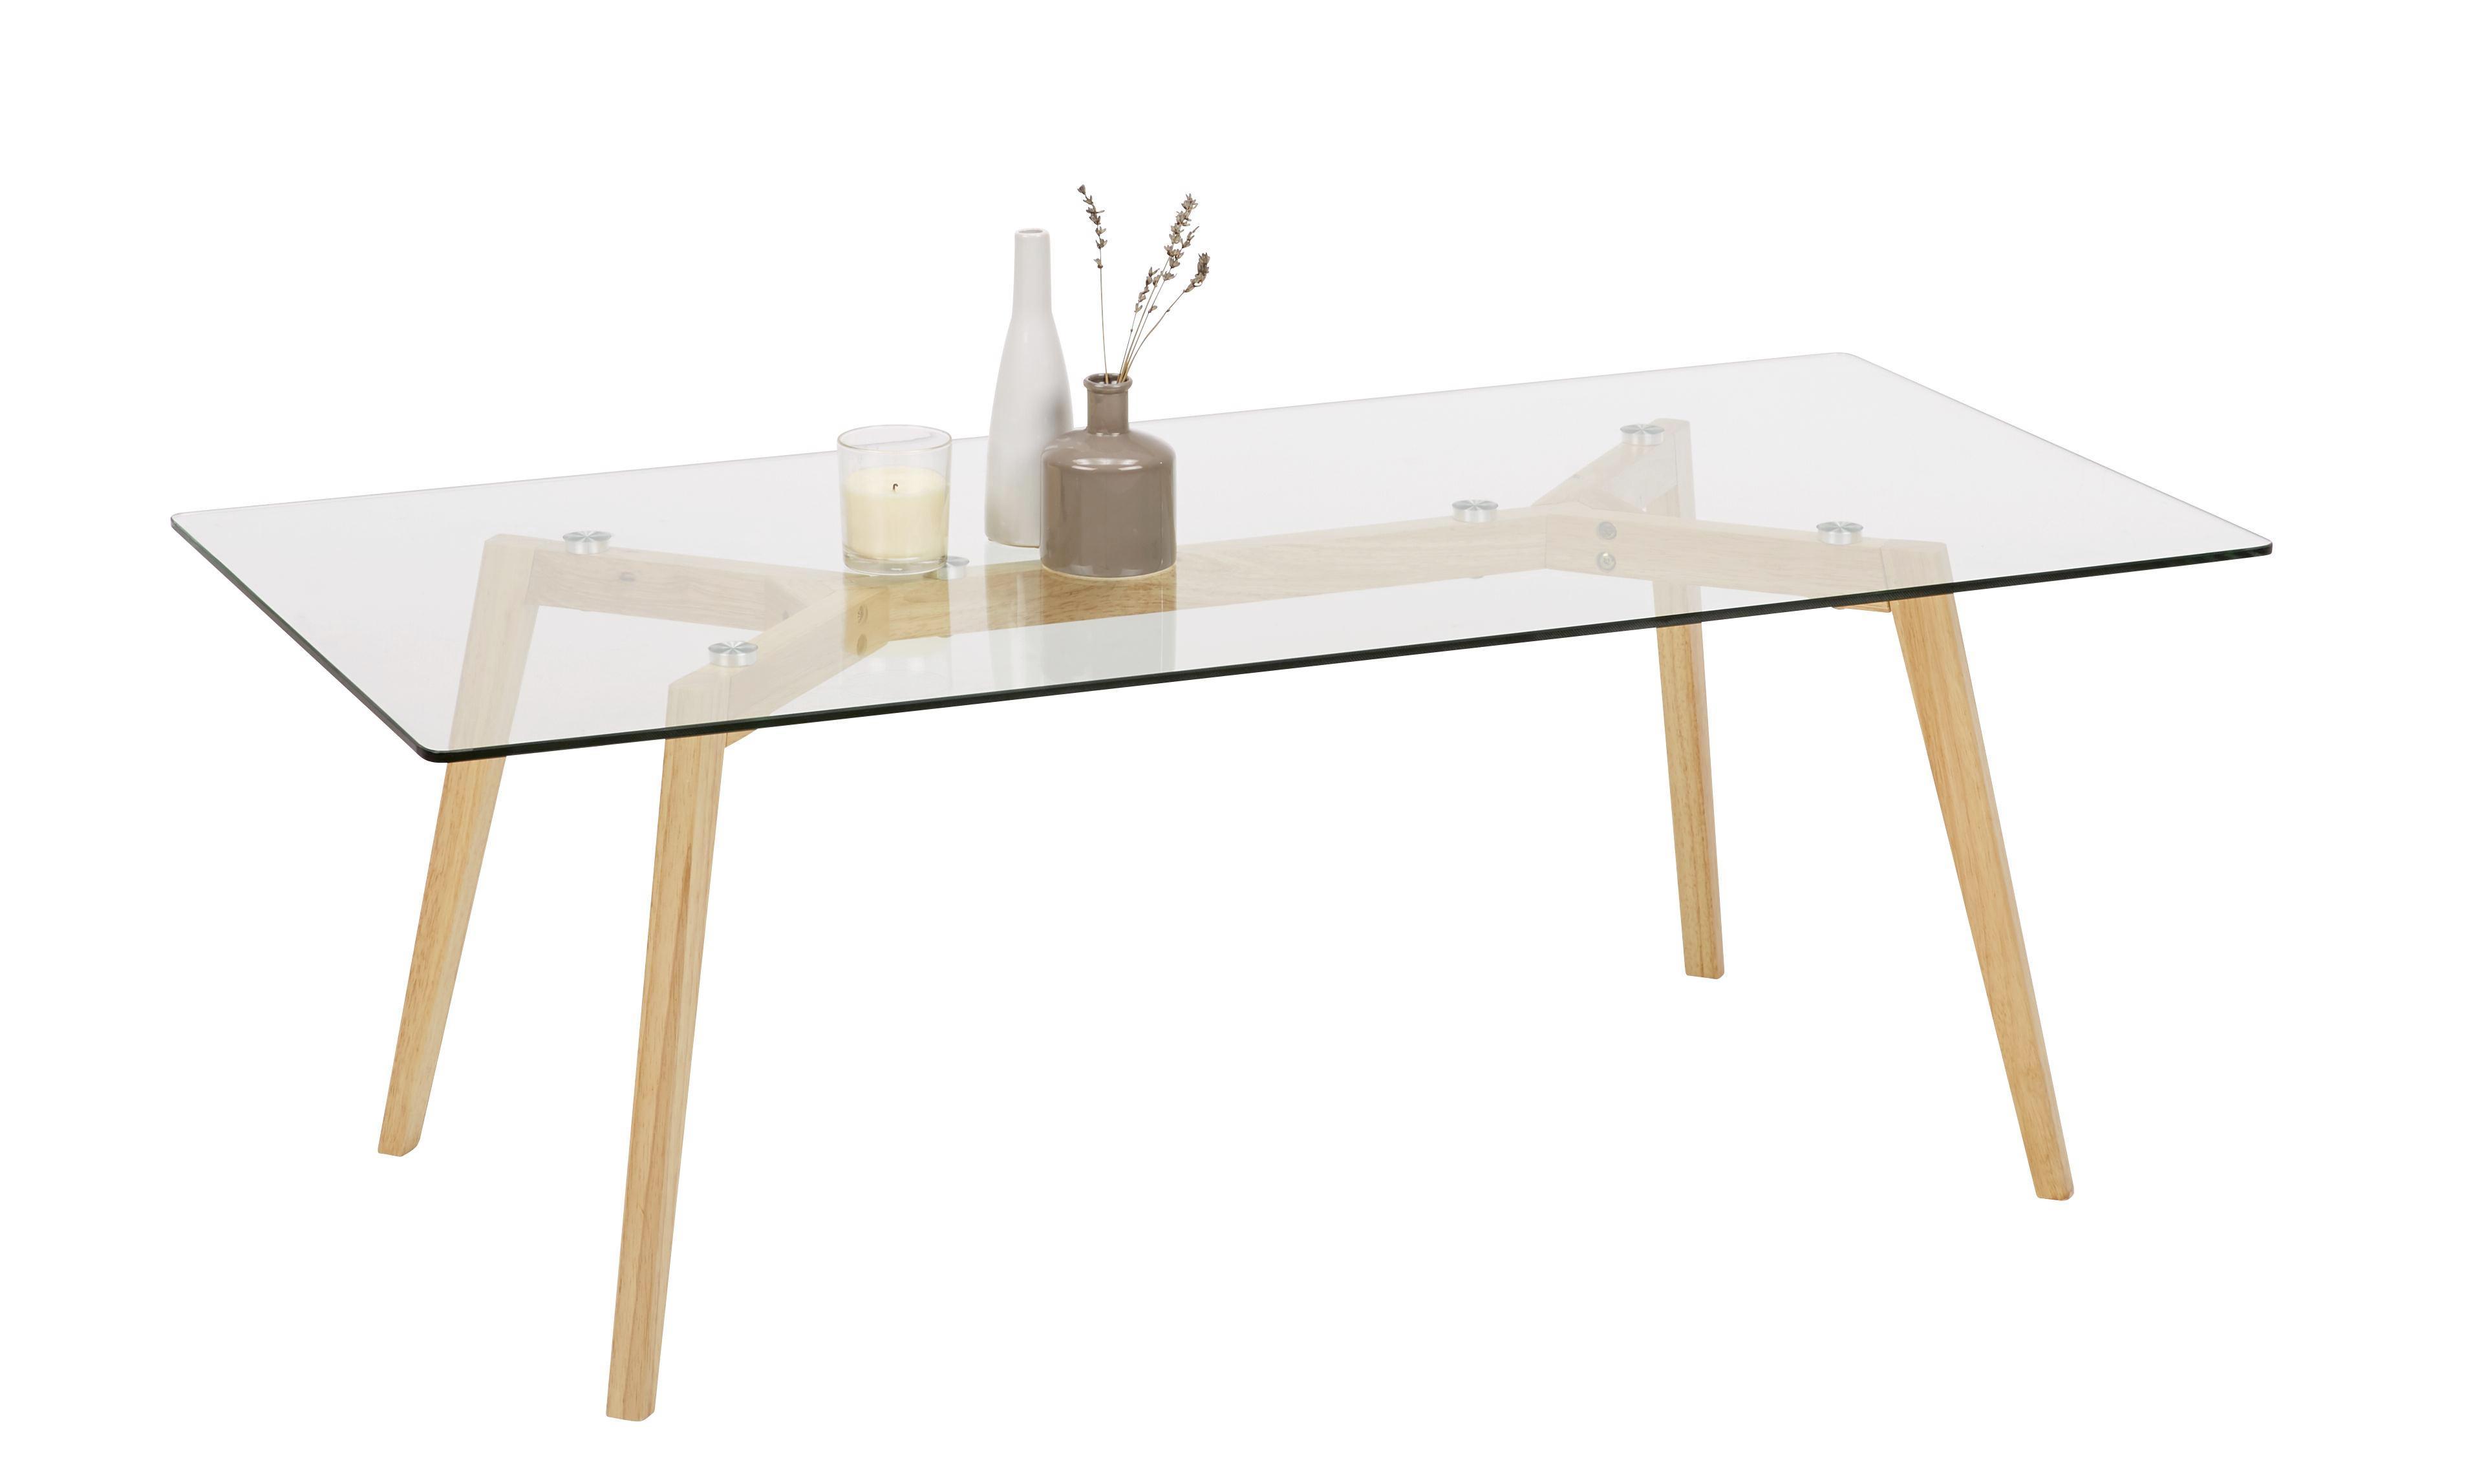 couchtisch glas awesome couchtisch glas with couchtisch. Black Bedroom Furniture Sets. Home Design Ideas